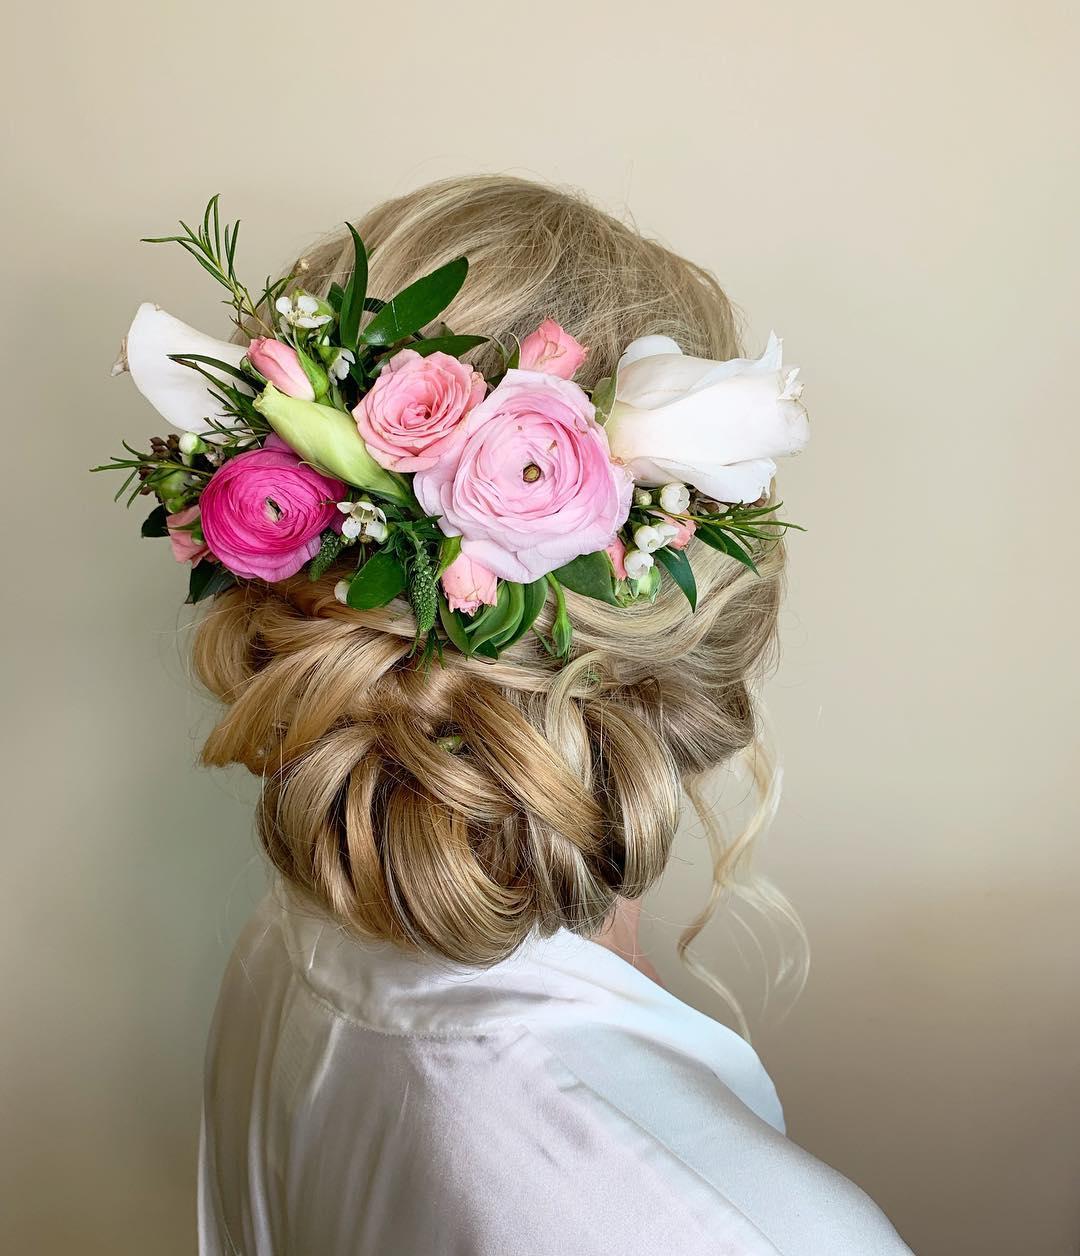 3 Well Travelled Bride Love and Beauty Maui Wedding Hair and Makeup Hawaii.jpg